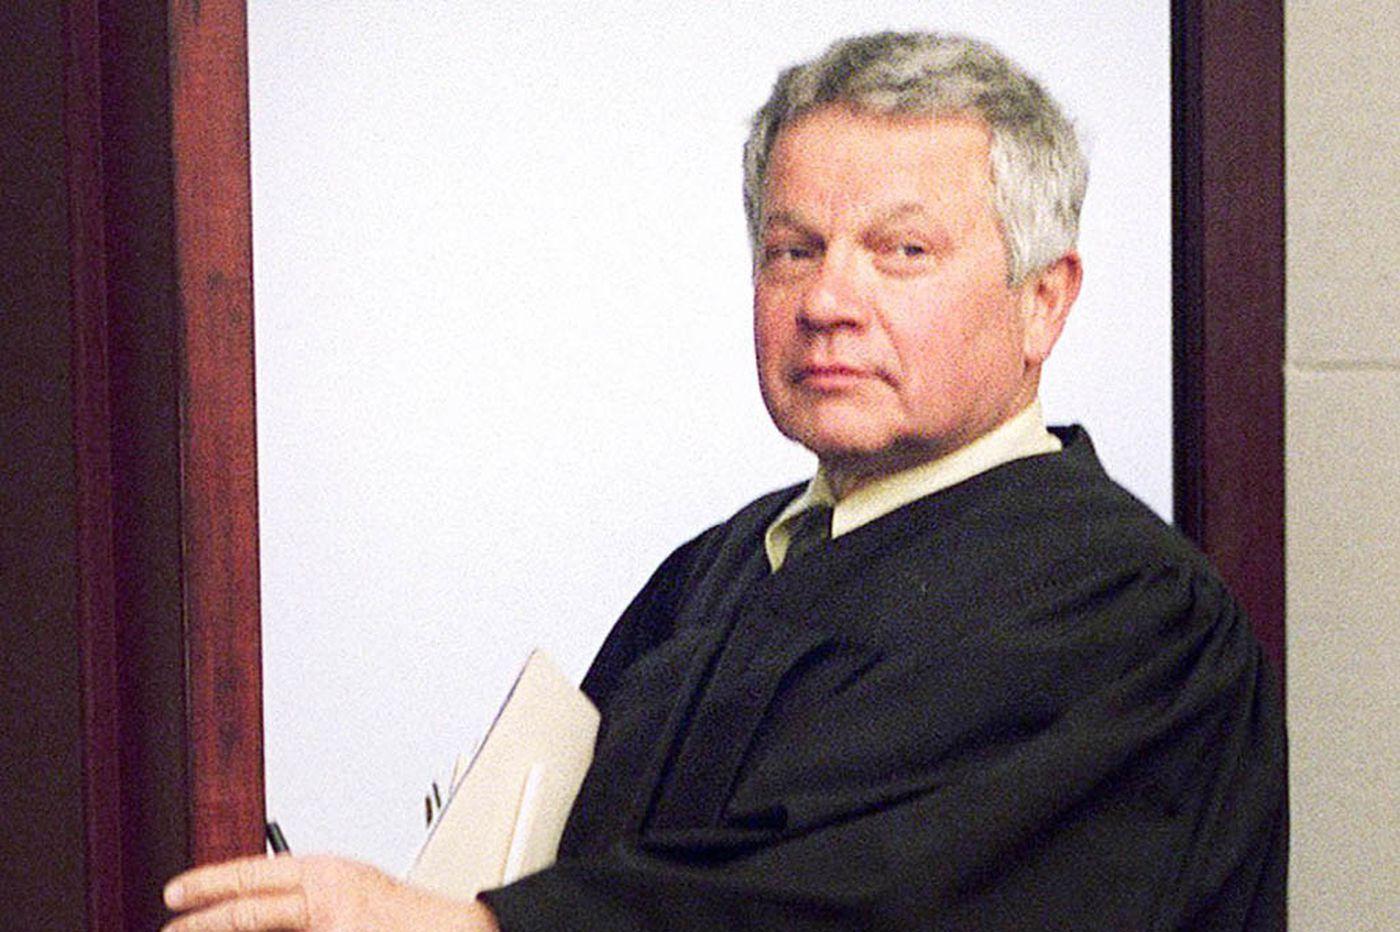 Judge wins praise for standards, improvements